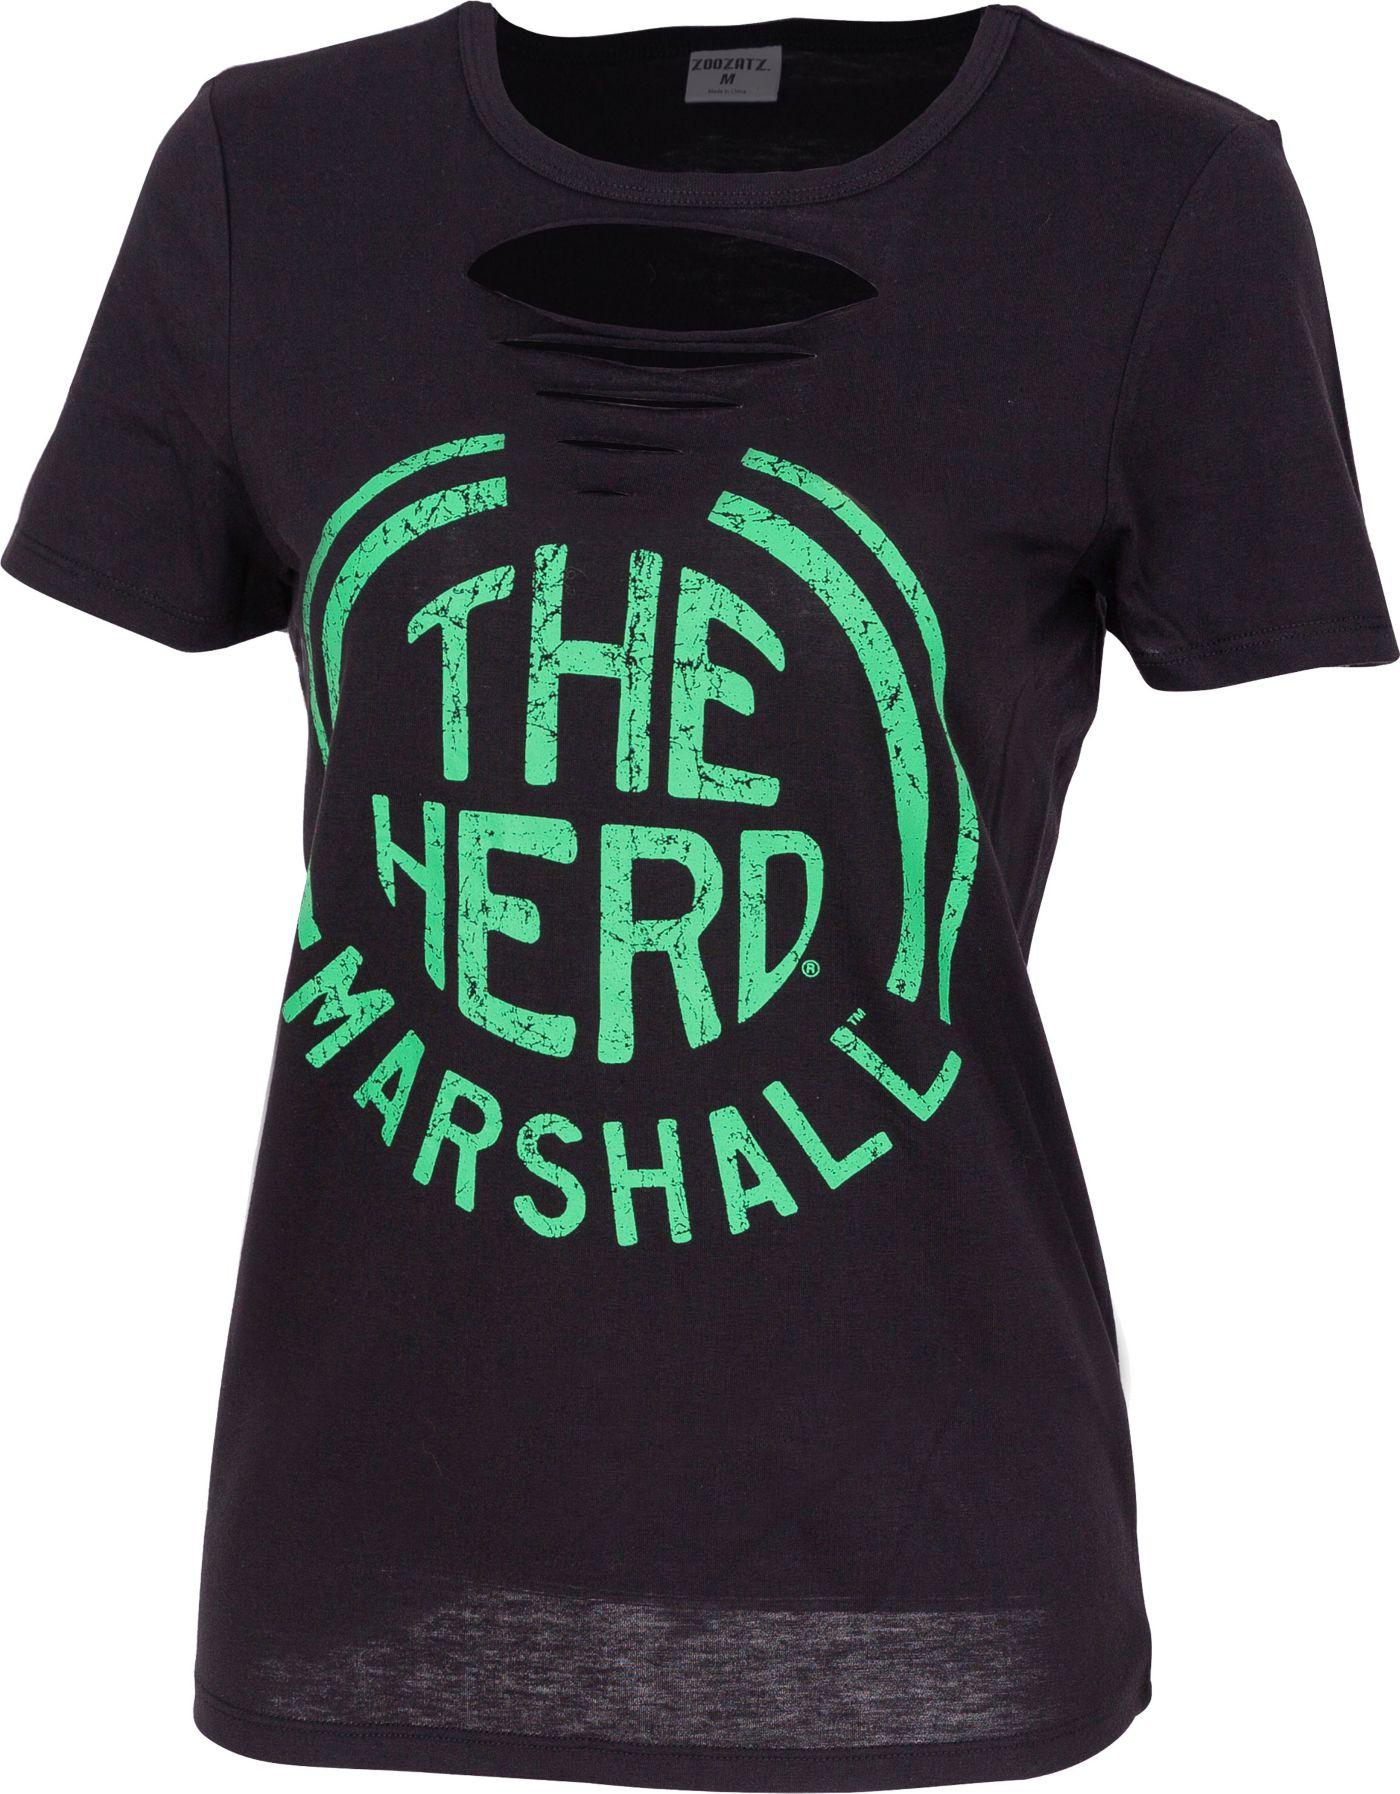 ZooZatz Women's Marshall Thundering Herd Revival Ripped Black T-Shirt